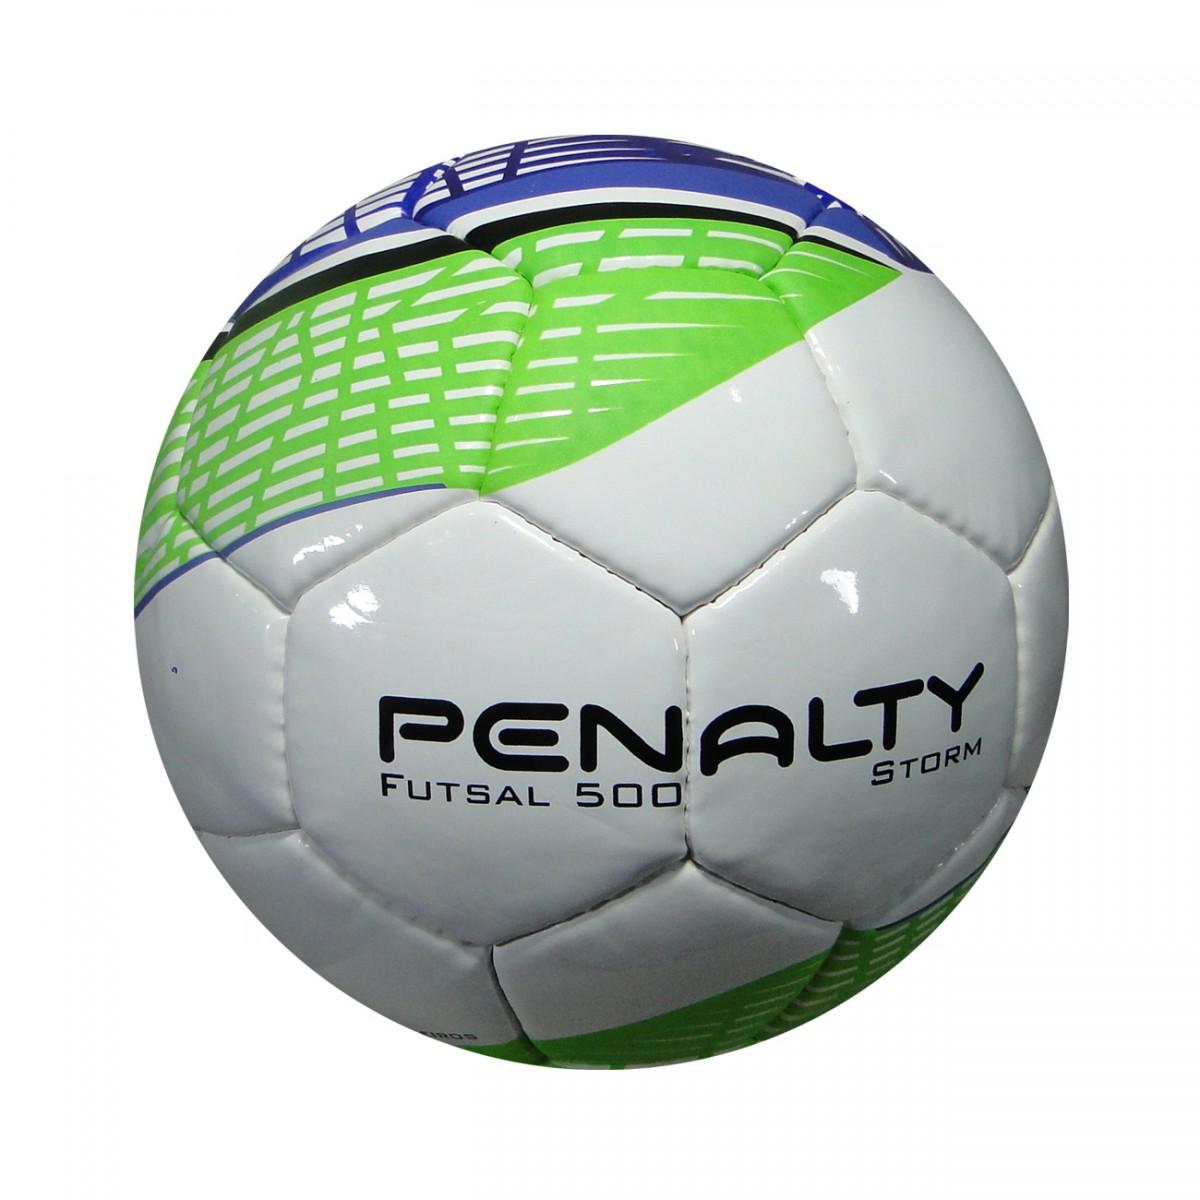 Bola Penalty 500 Storm Futsal 5104681992 - Branco Verde Roxo - Chuteira Nike 55de9f08f1471